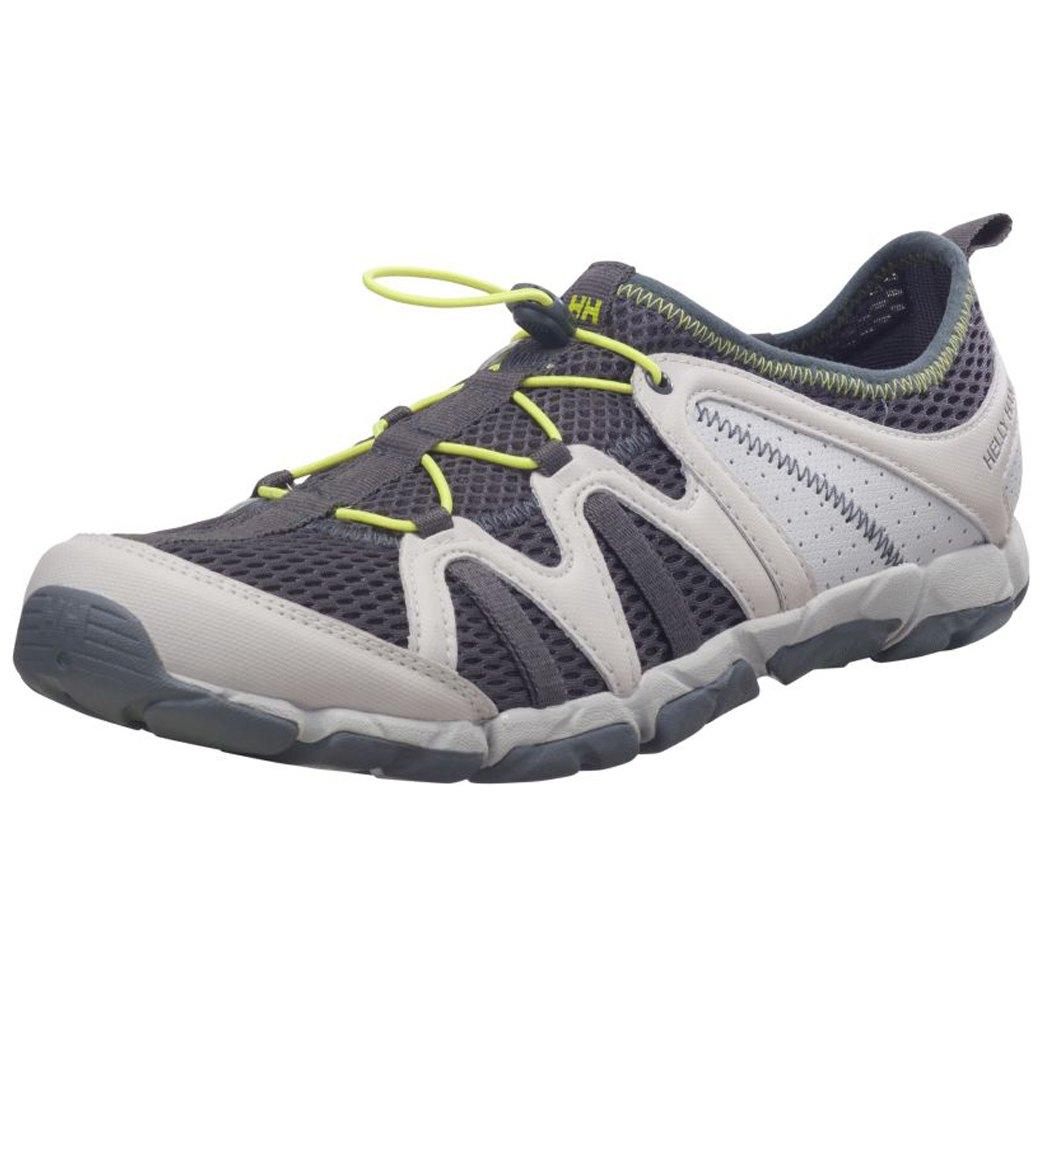 2983254293c5 Helly Hansen Men s Aquapace Water Shoes at SwimOutlet.com